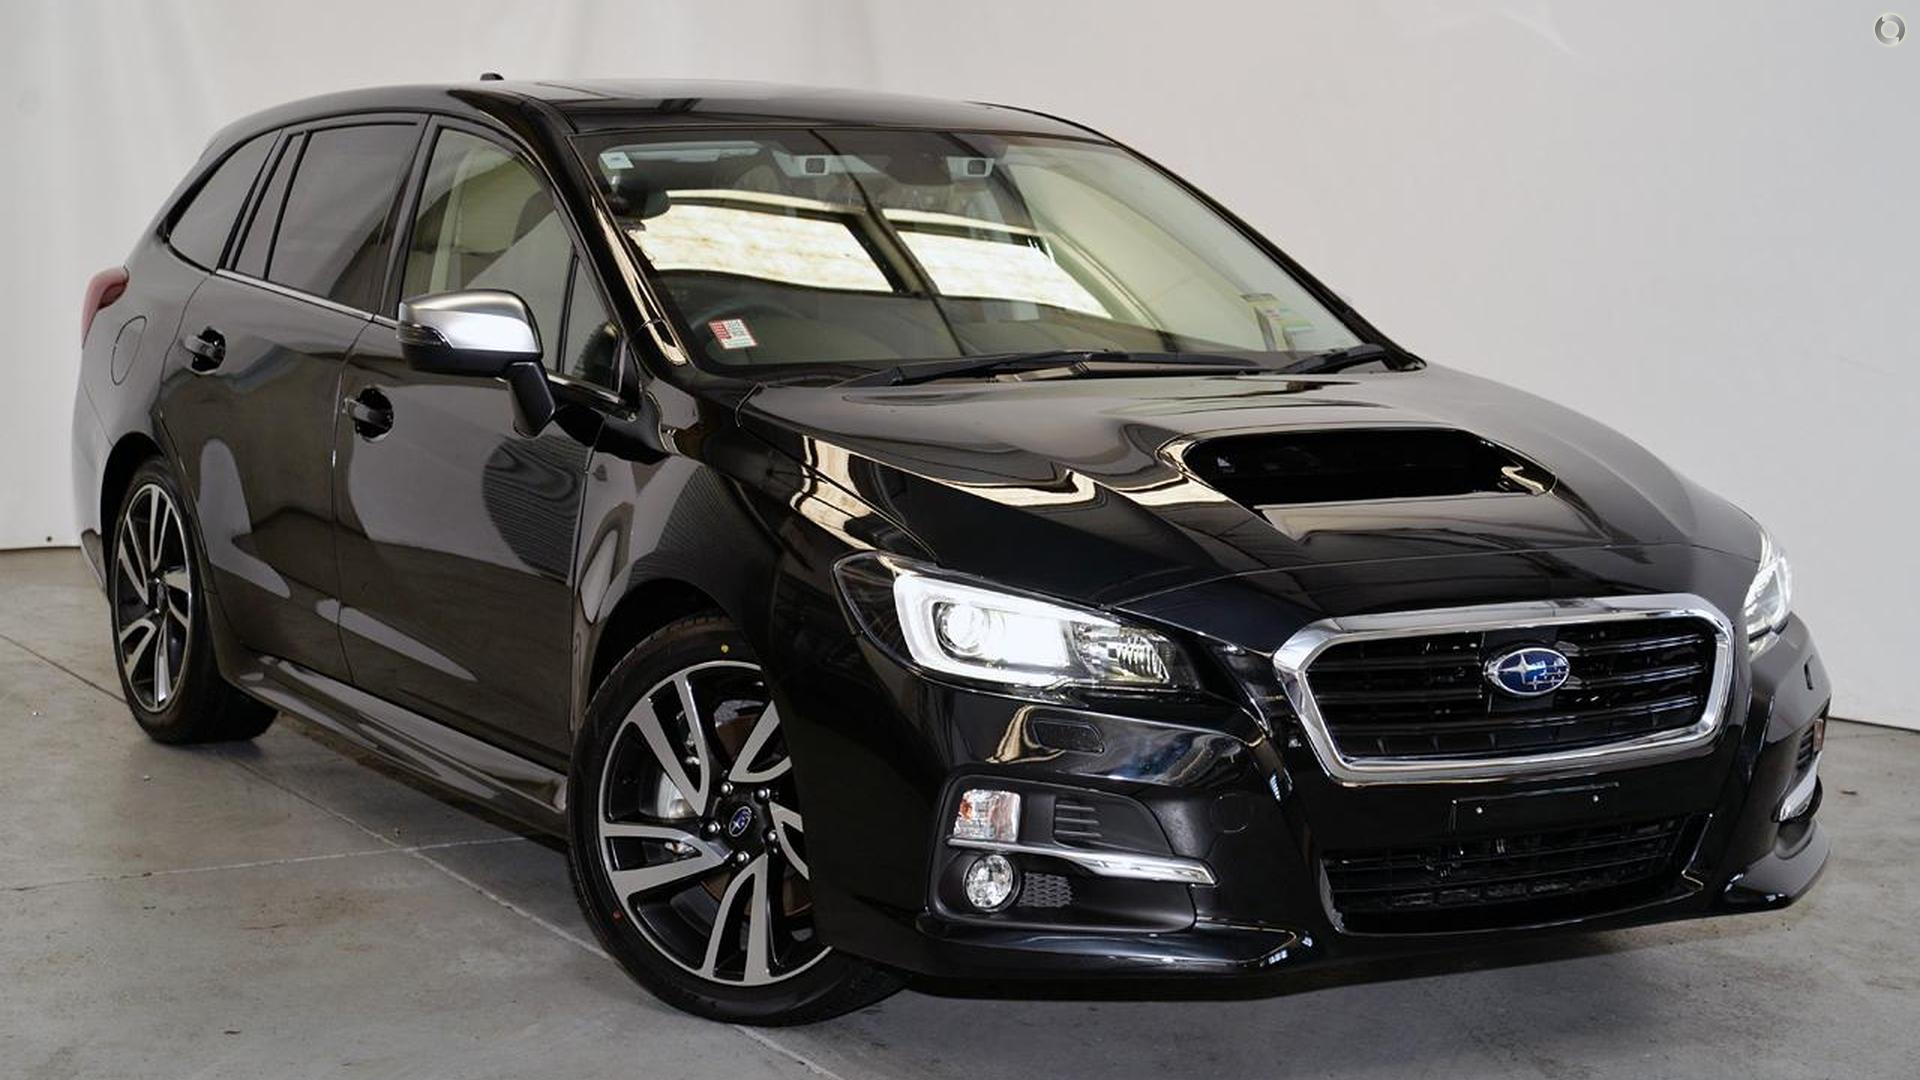 2017 Subaru Levorg 2.0 Gt-s